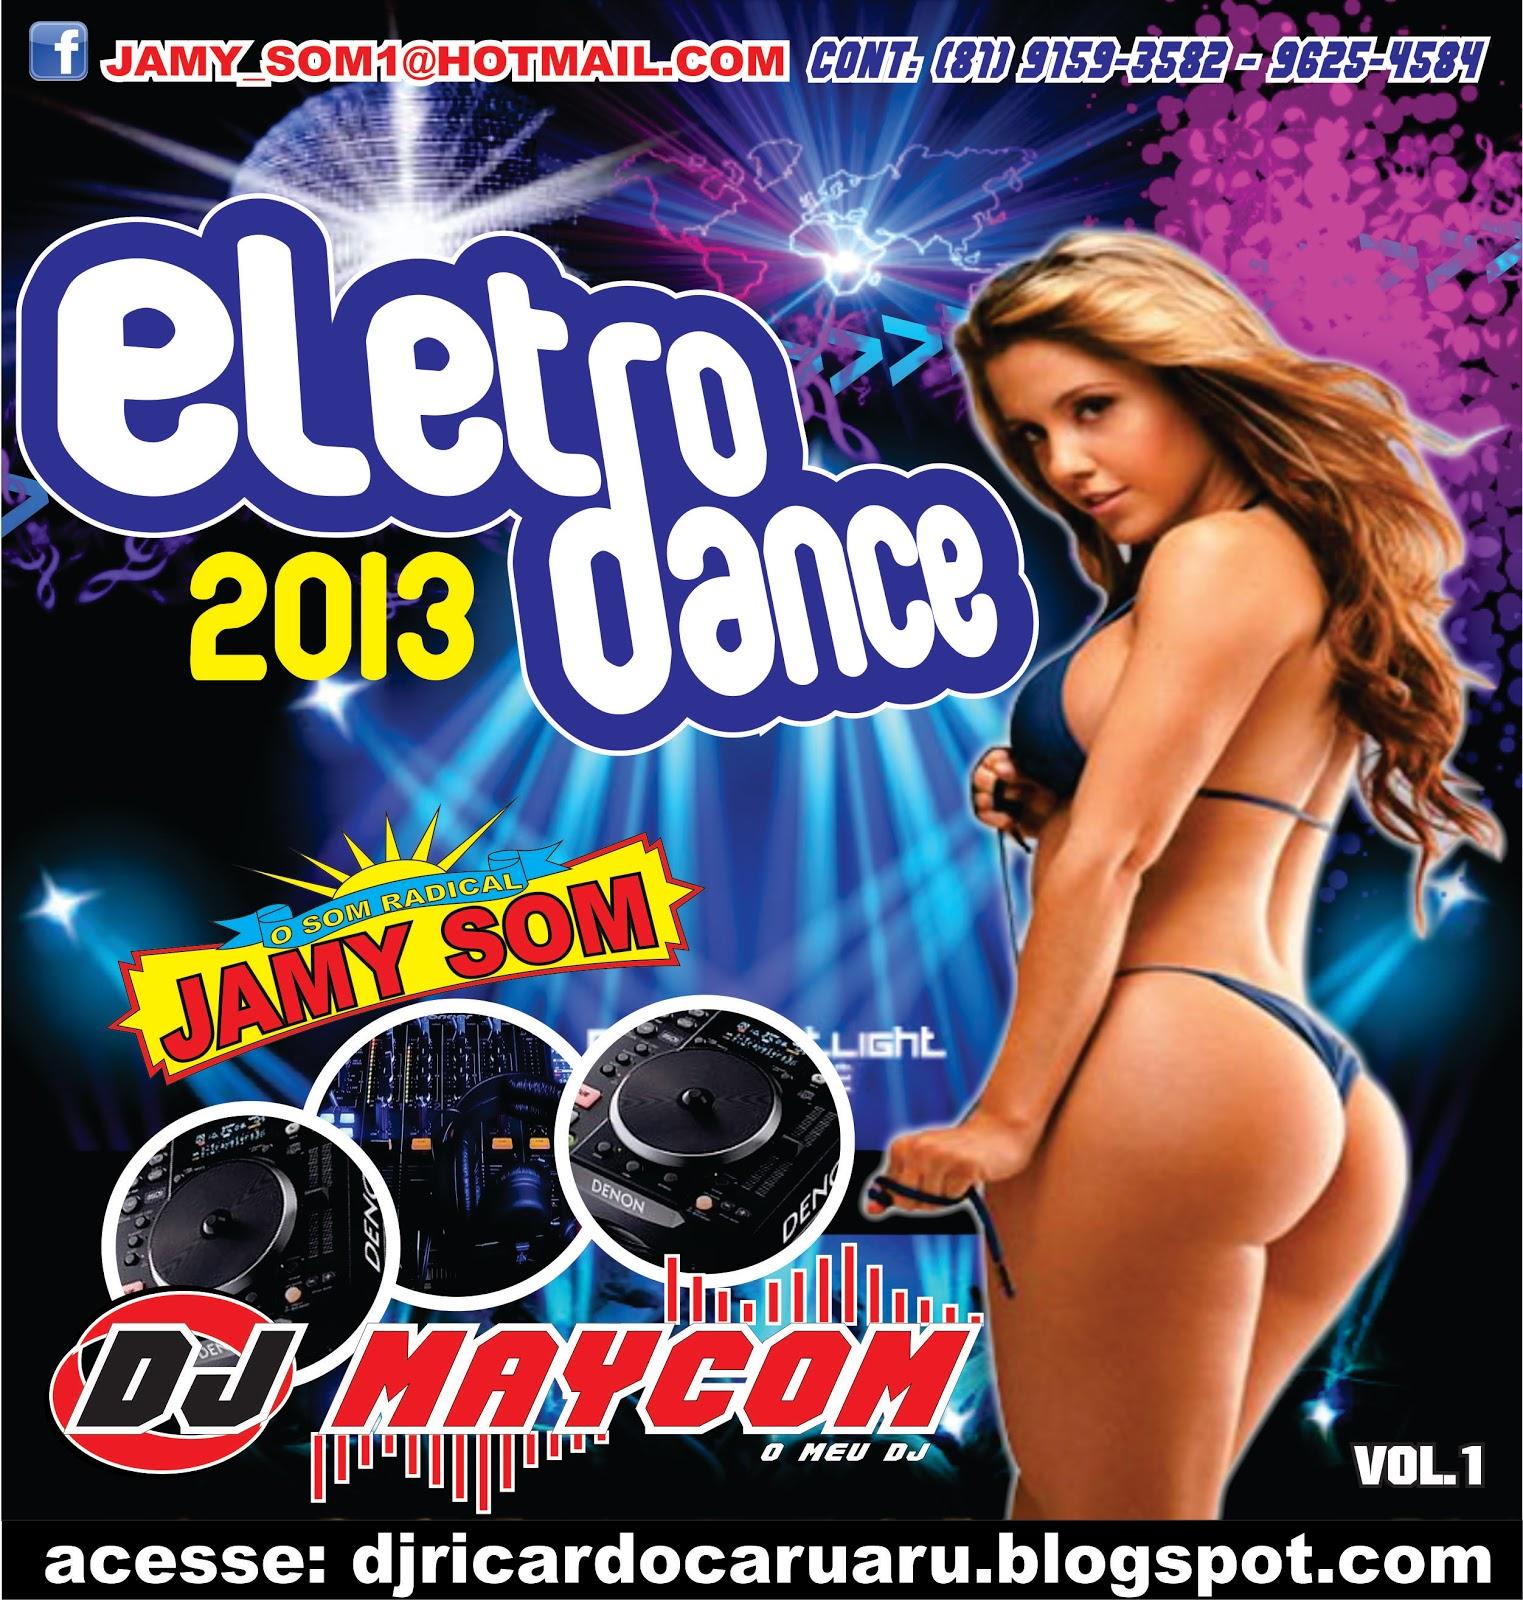 BAIXAR - CD Eletro Dance 2013 - Dj Maycom